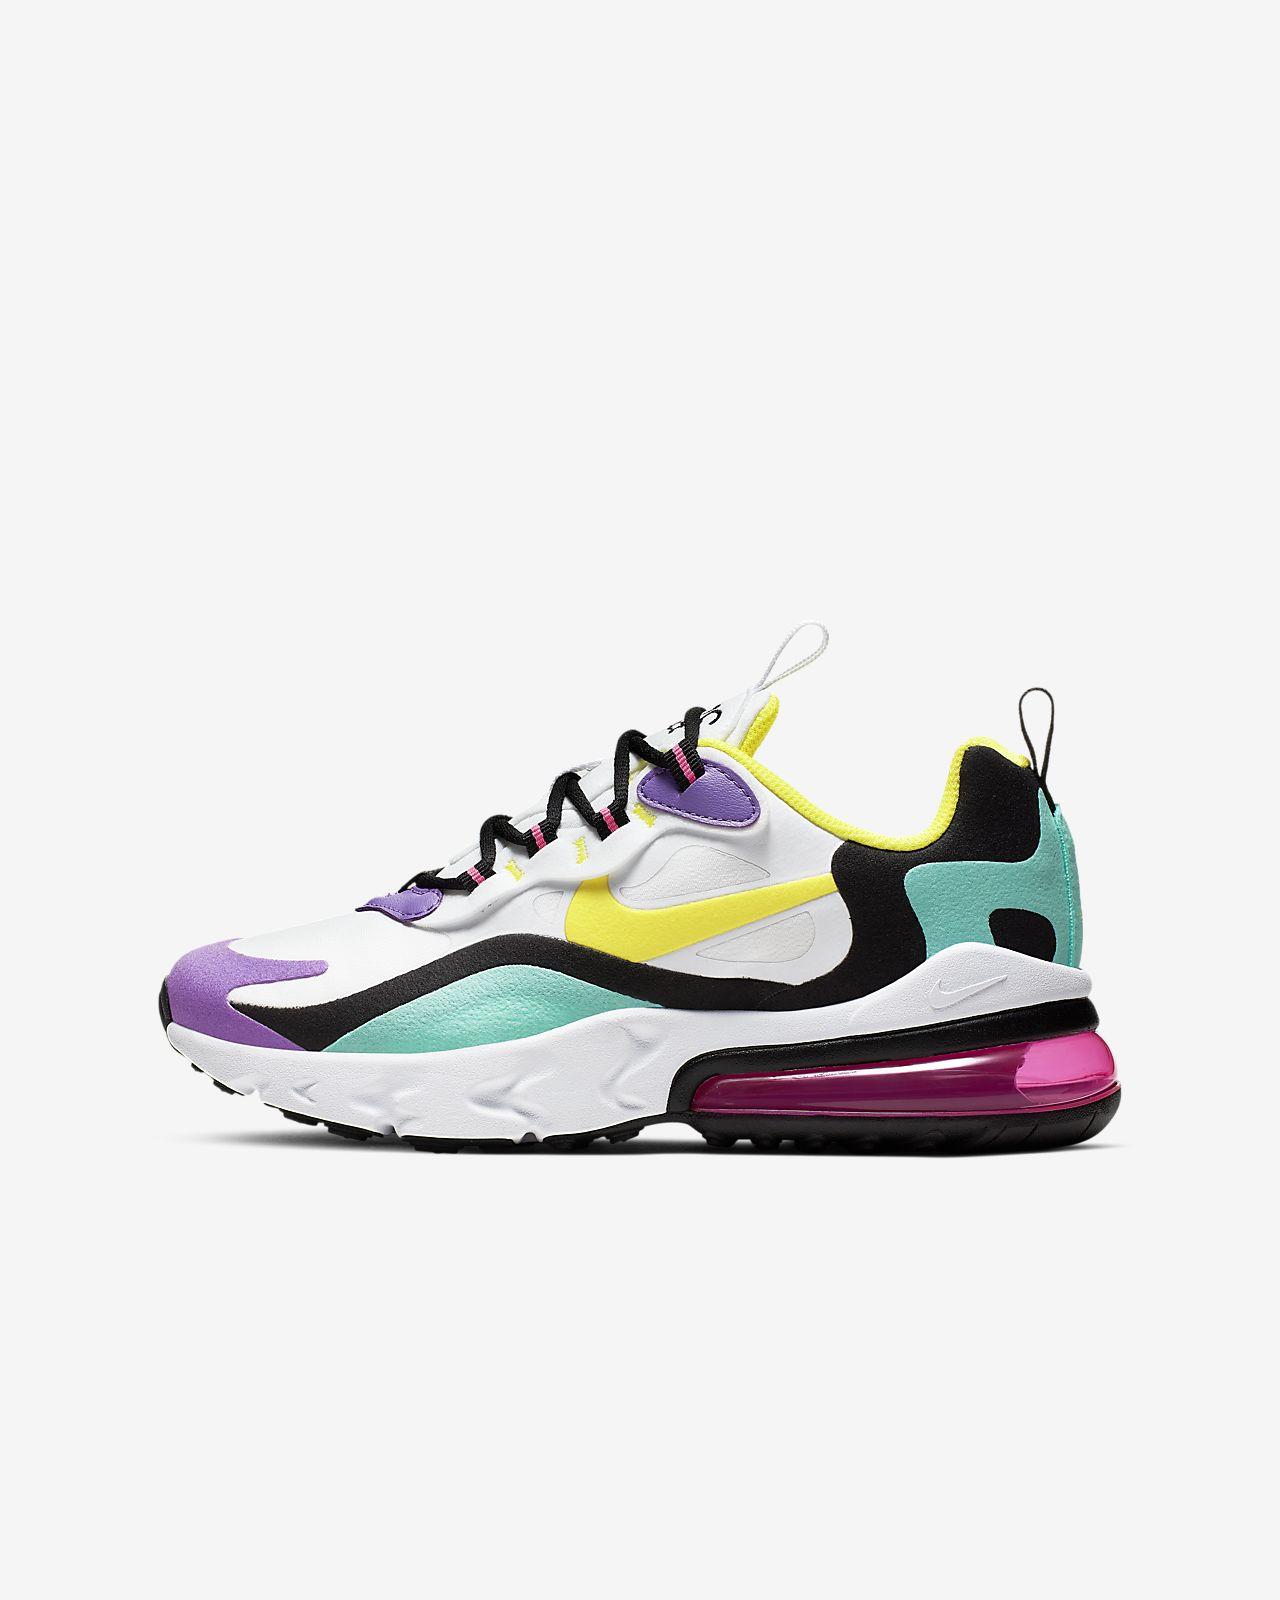 Nike Air Max 270 Schuhe Reduziert Kaufen Nike